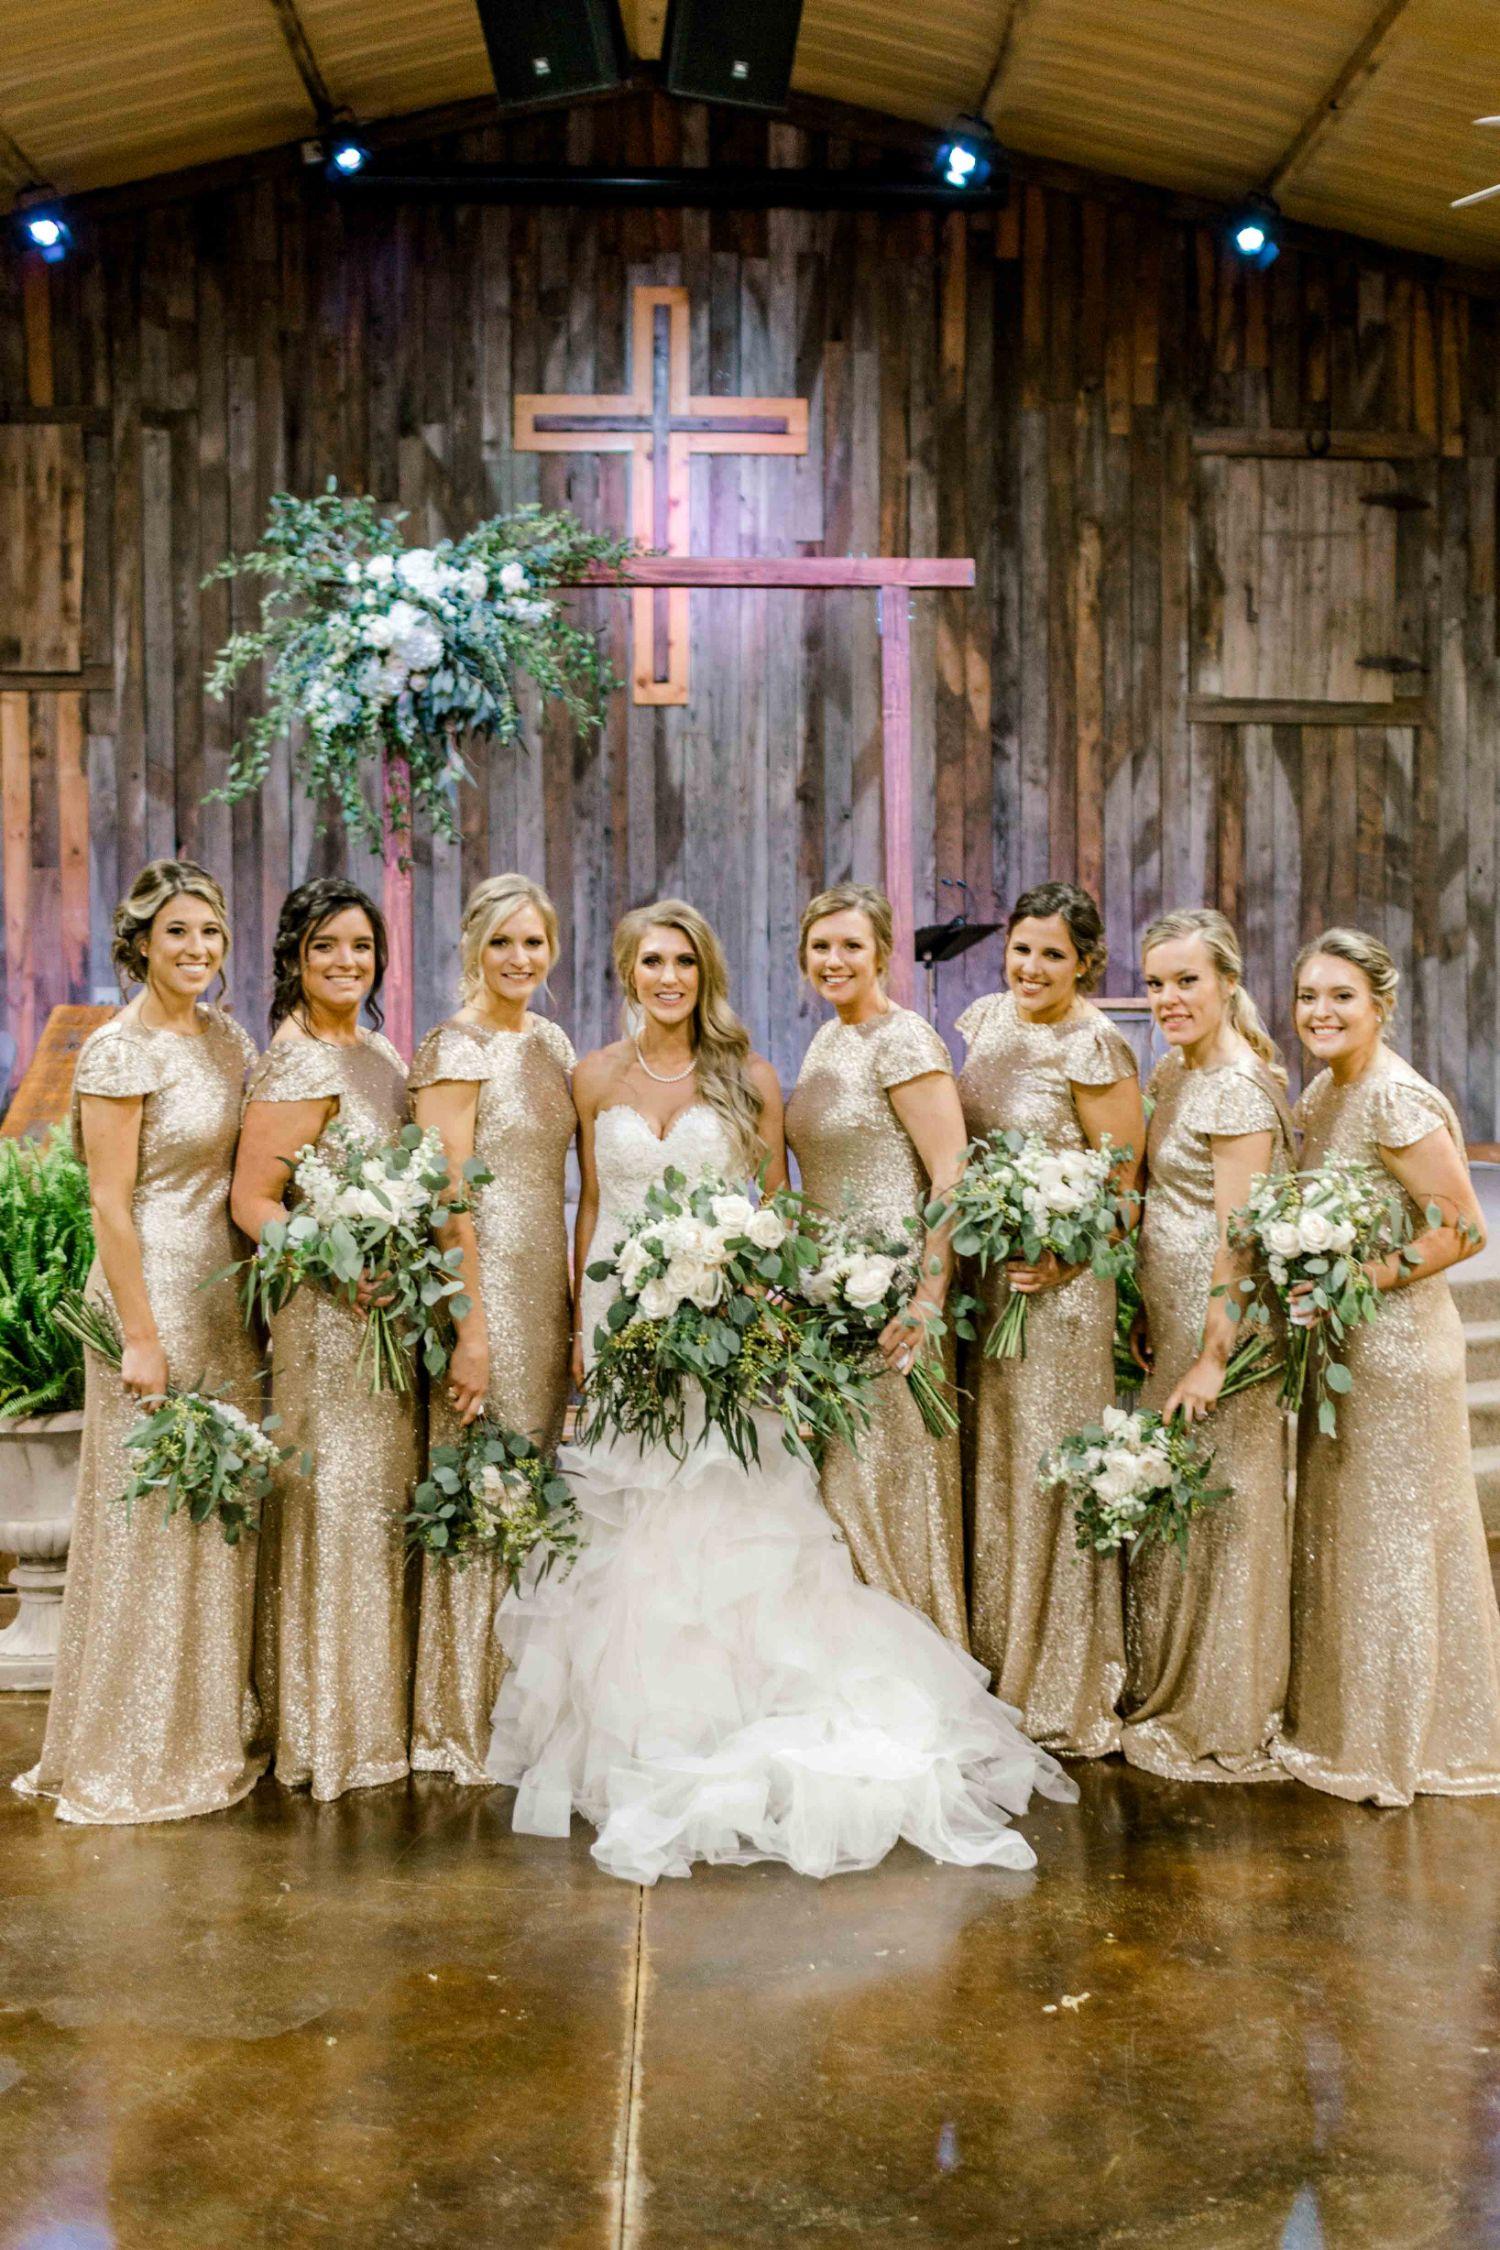 katelyn-colten-wichita-falls-wedding-photographer-11.jpg